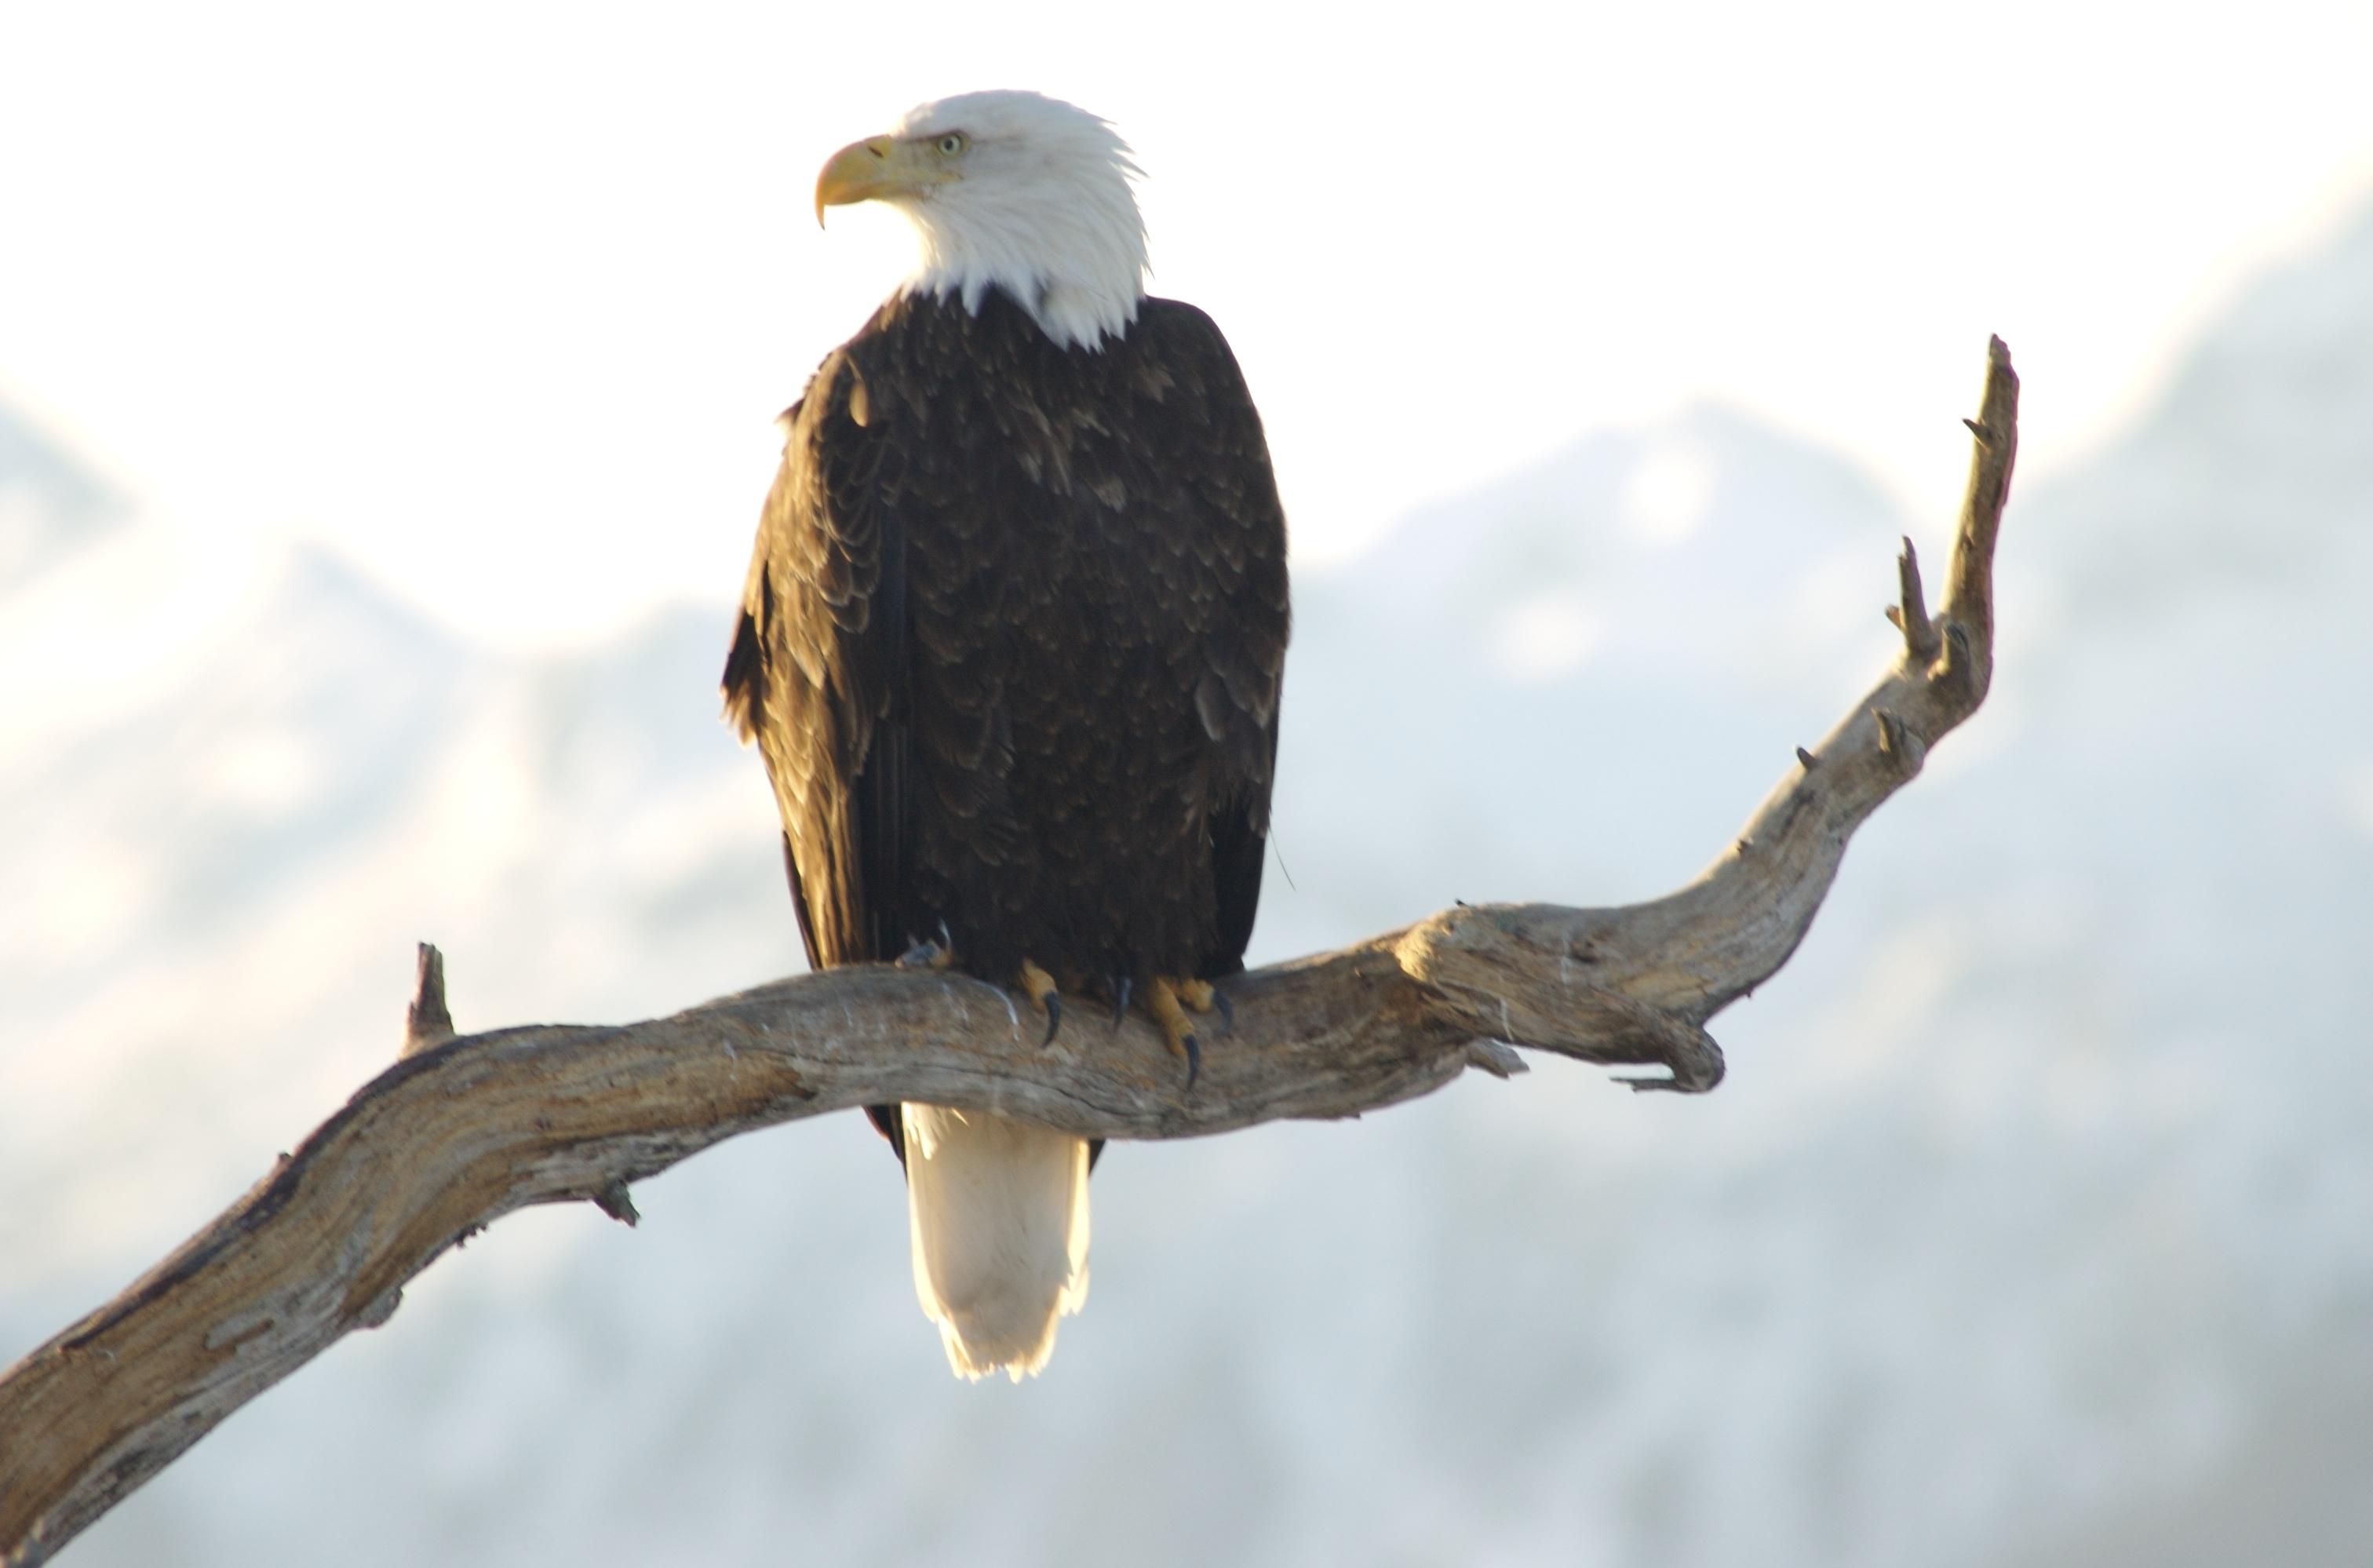 File:Bald Eagle Alaska (16).jpg - Wikimedia Commons